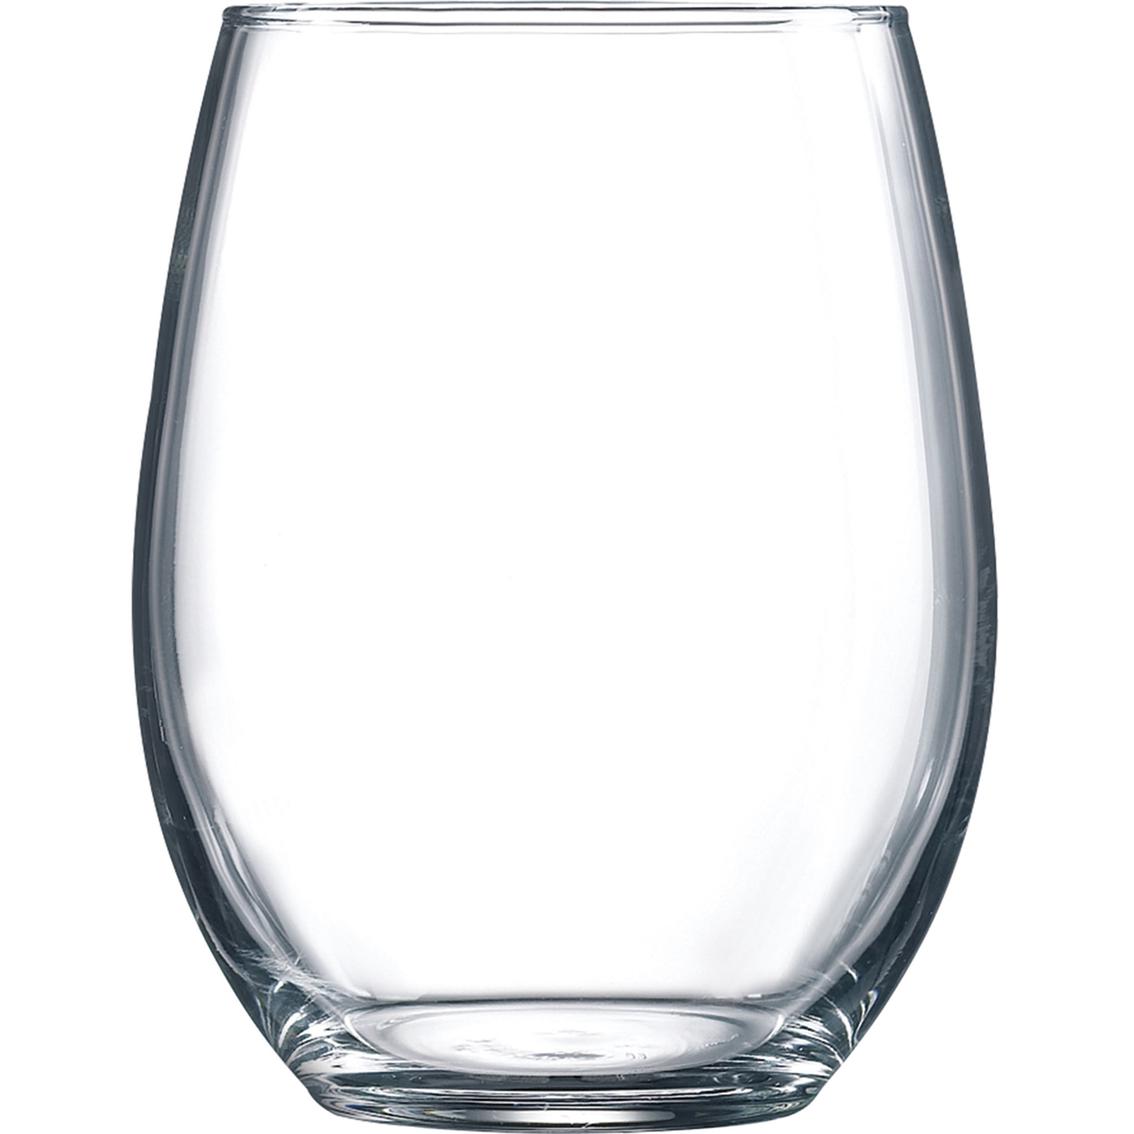 arc international luminarc cachet 4 pc stemless wine glass set beer bar wine glasses. Black Bedroom Furniture Sets. Home Design Ideas